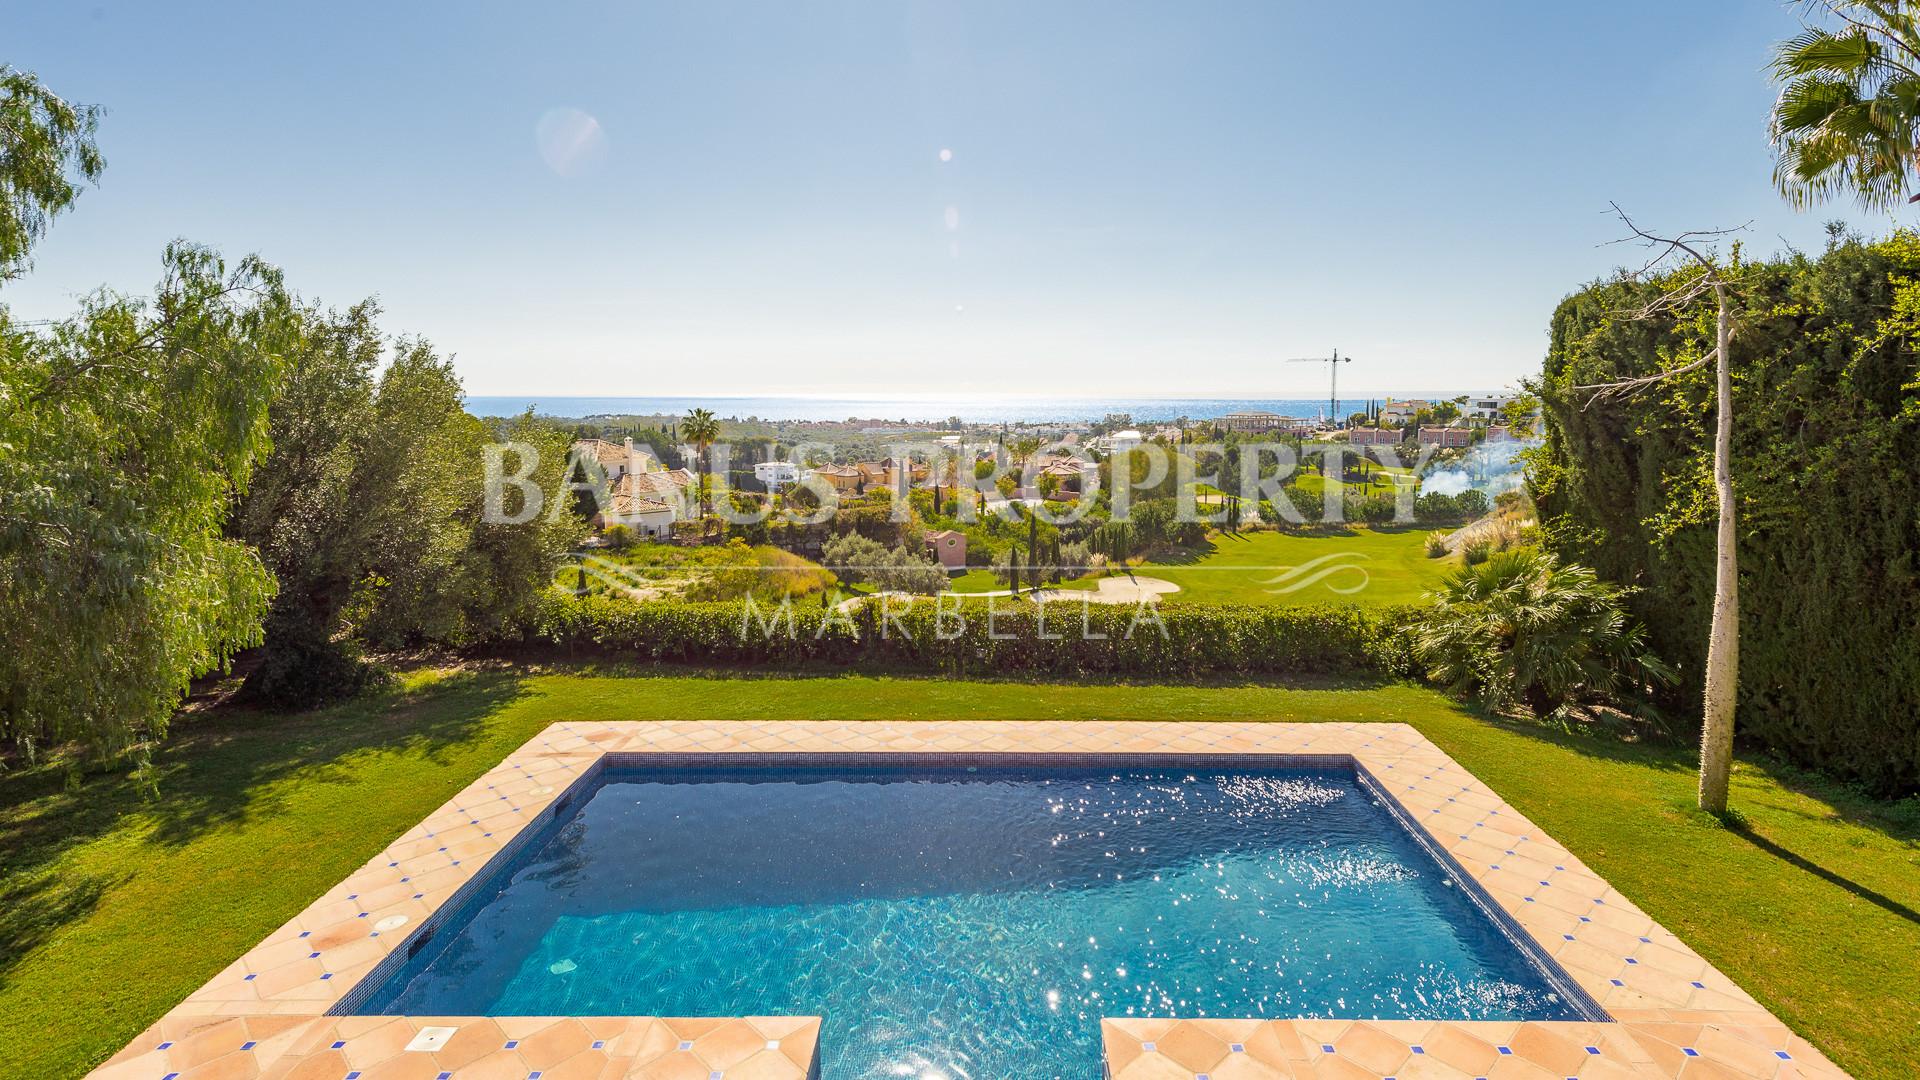 The Best Frontline Golf Villa Opportunity In Los Flamingos